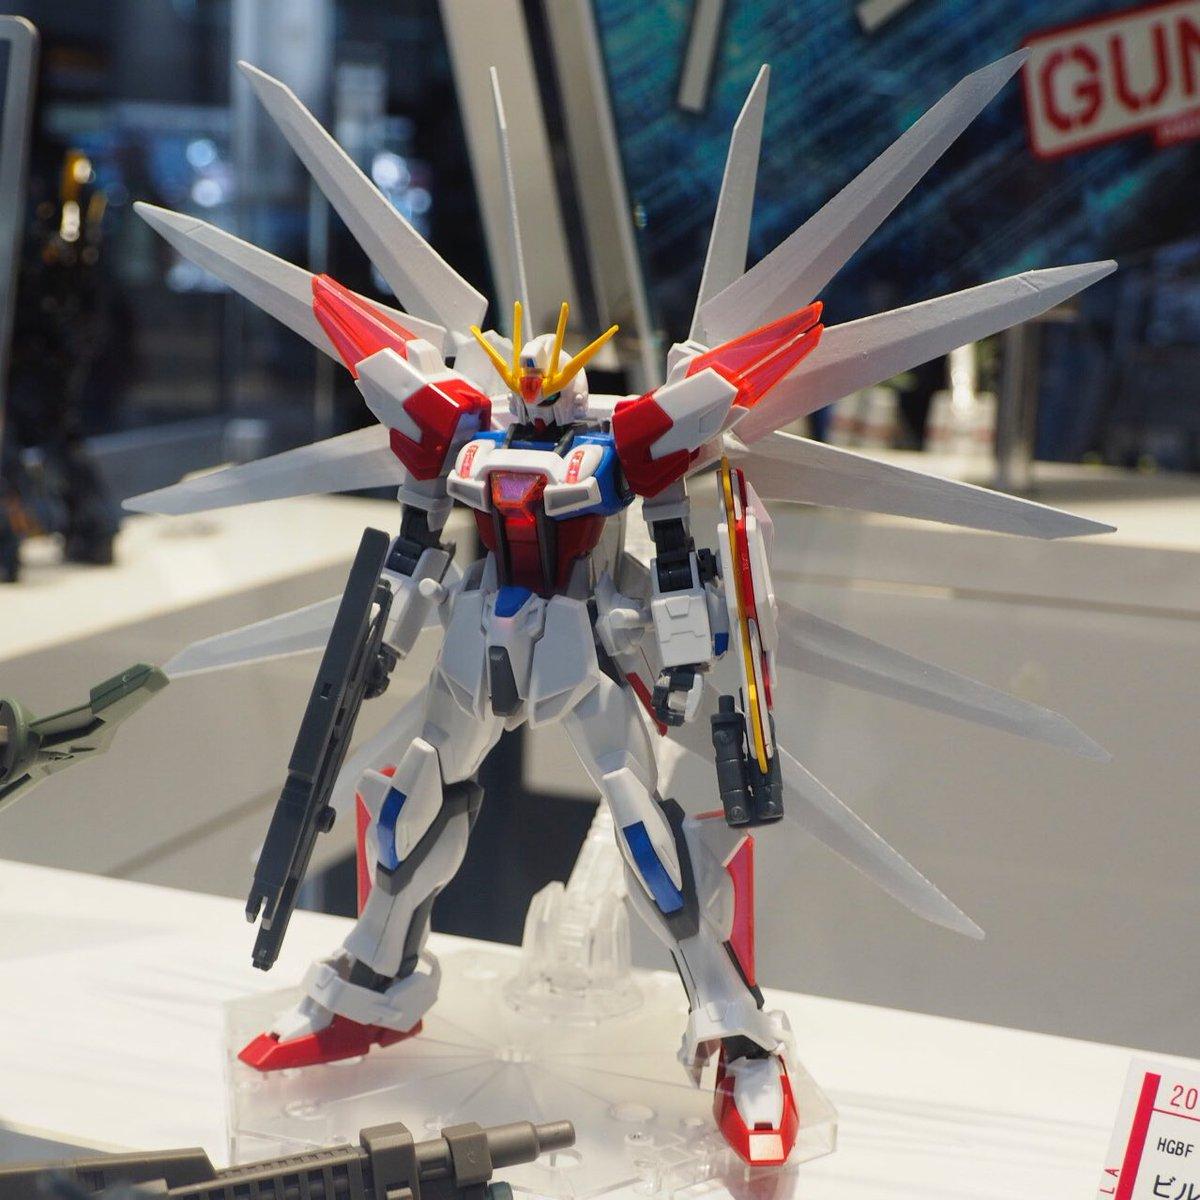 Build Strike Galaxy Cosmos GUNPLA HGBF High Grade Build Fighters 1//144 BANDAI